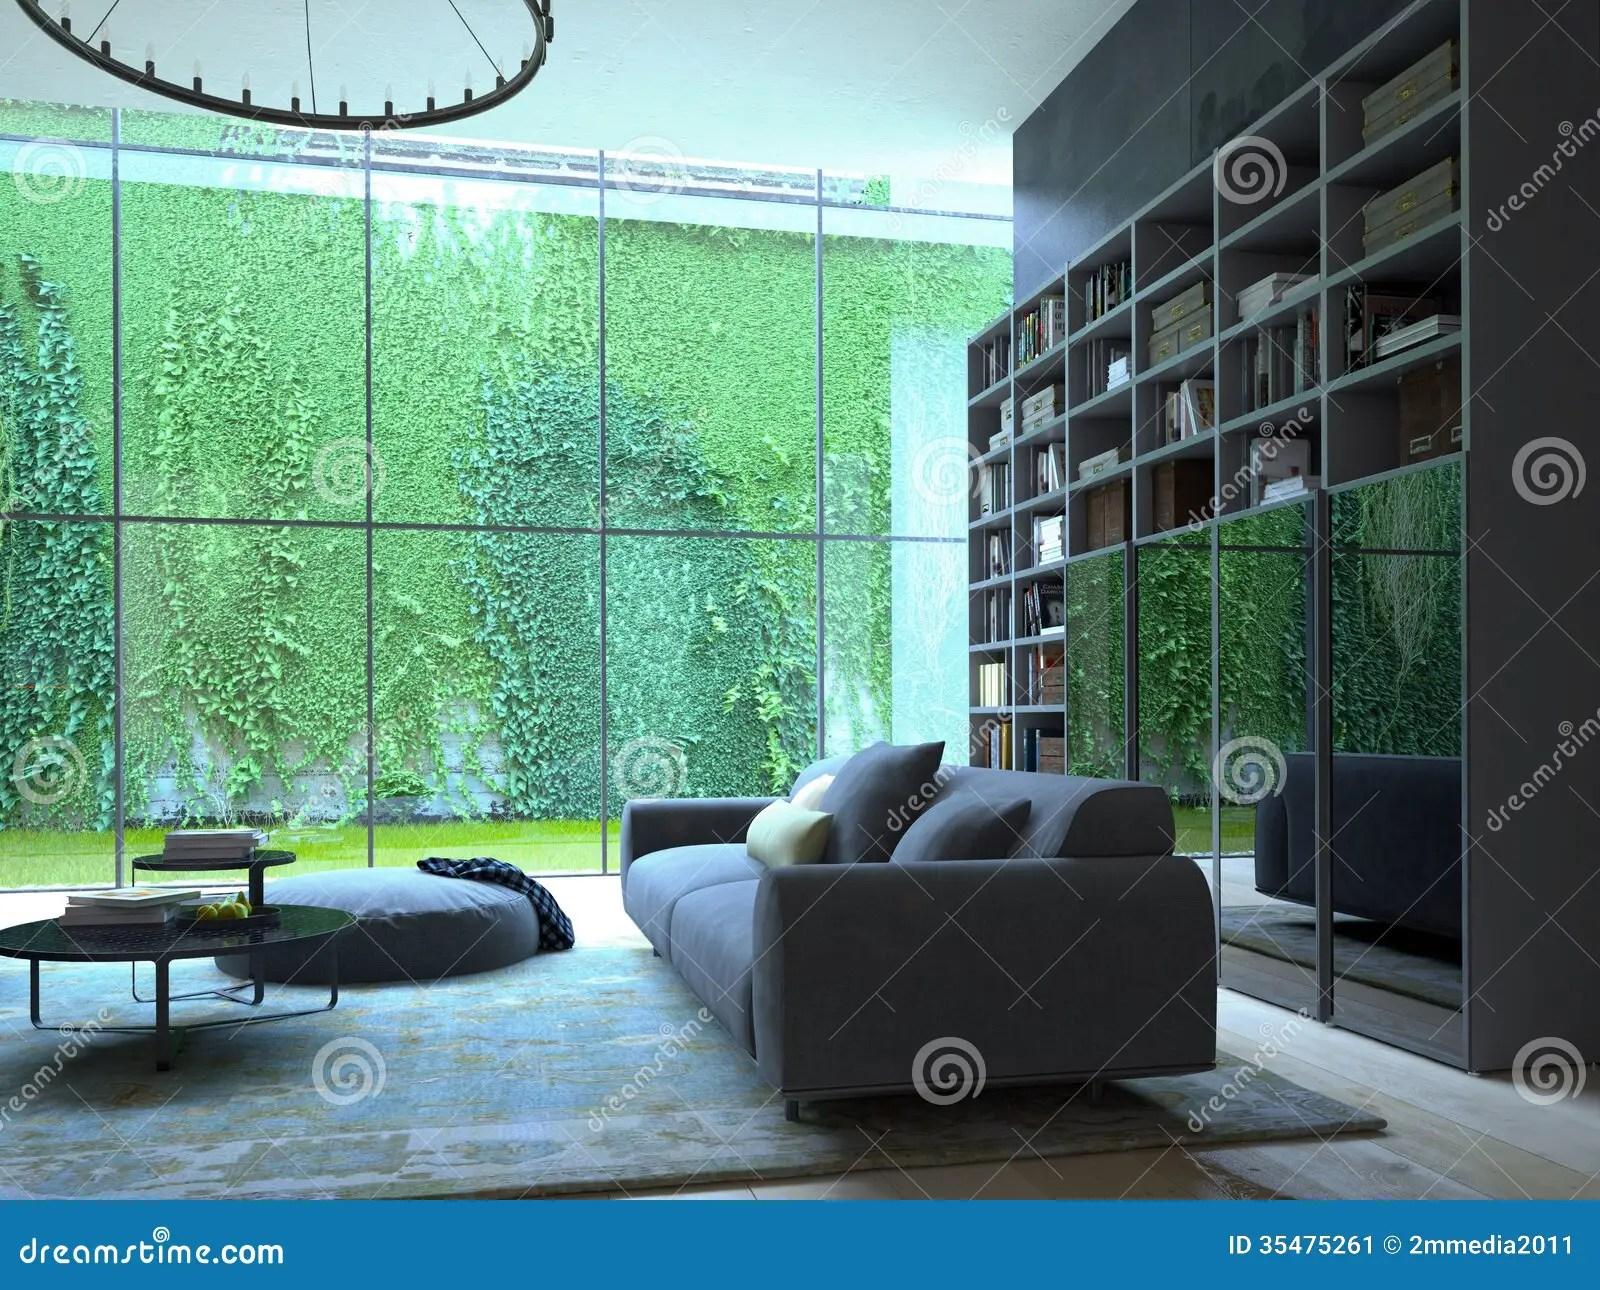 Living room stock illustration Image of light interior  35475261